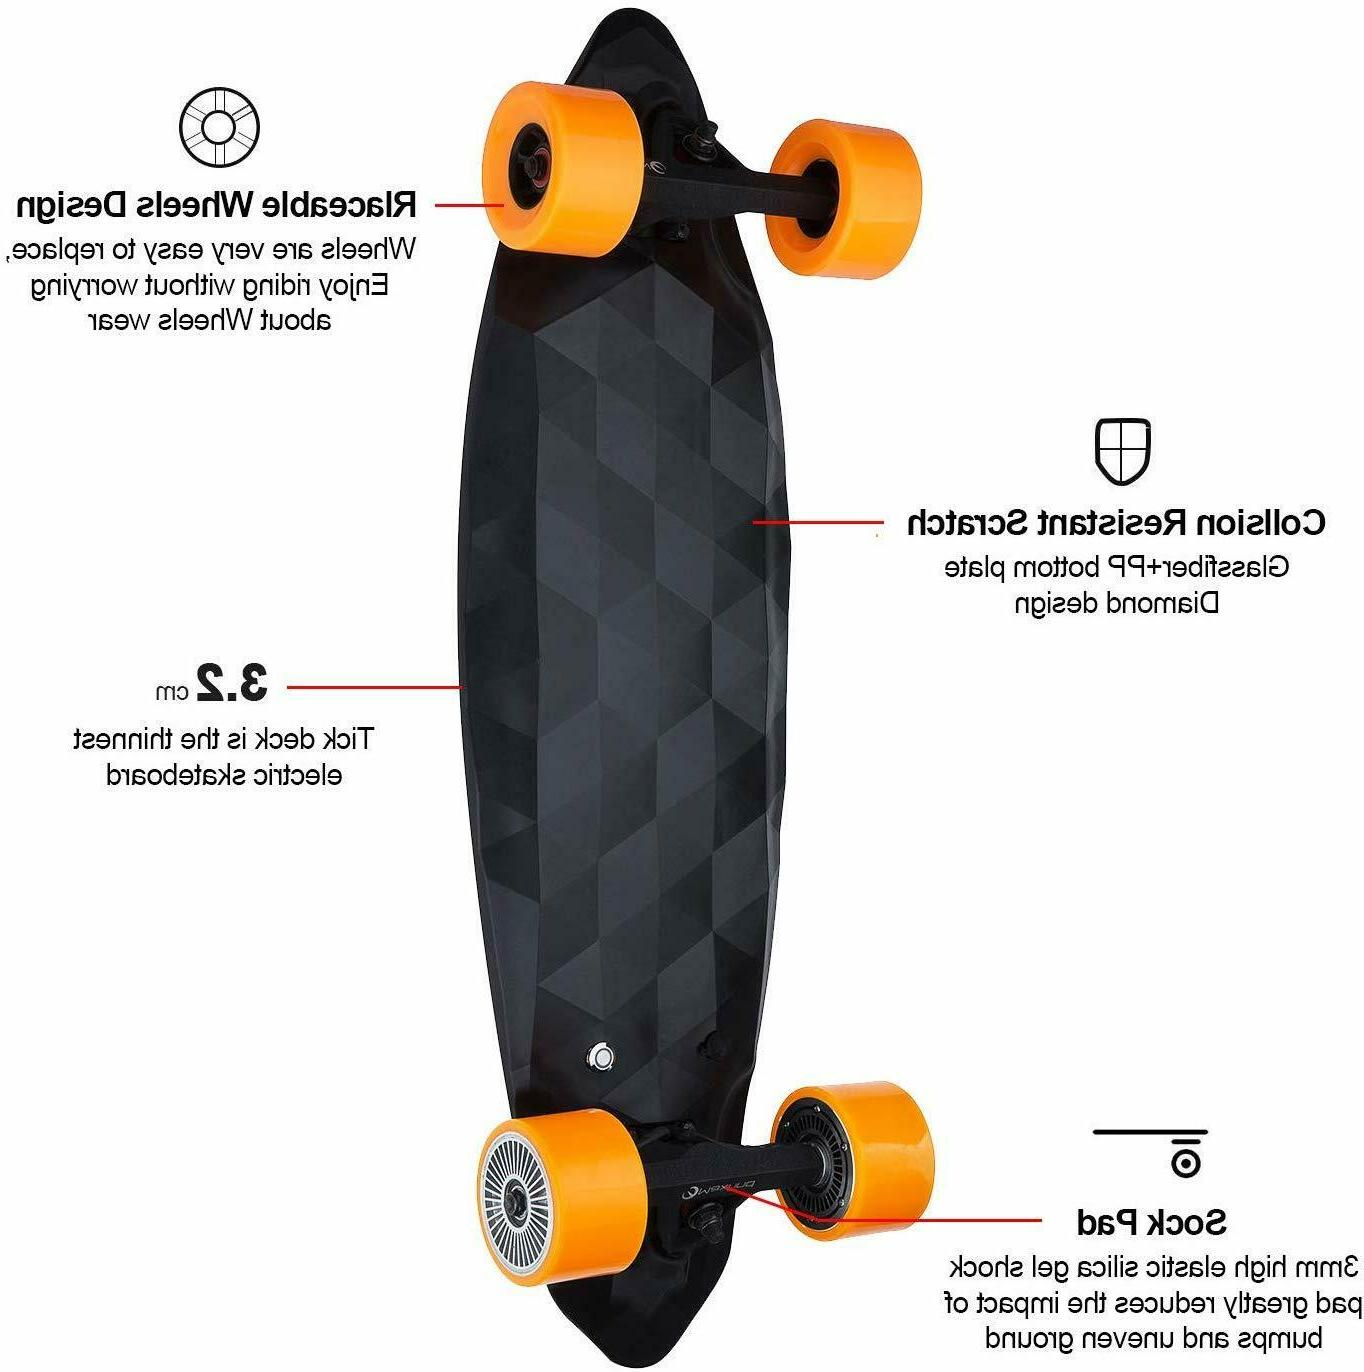 USA Skateboard Wireless Accessory